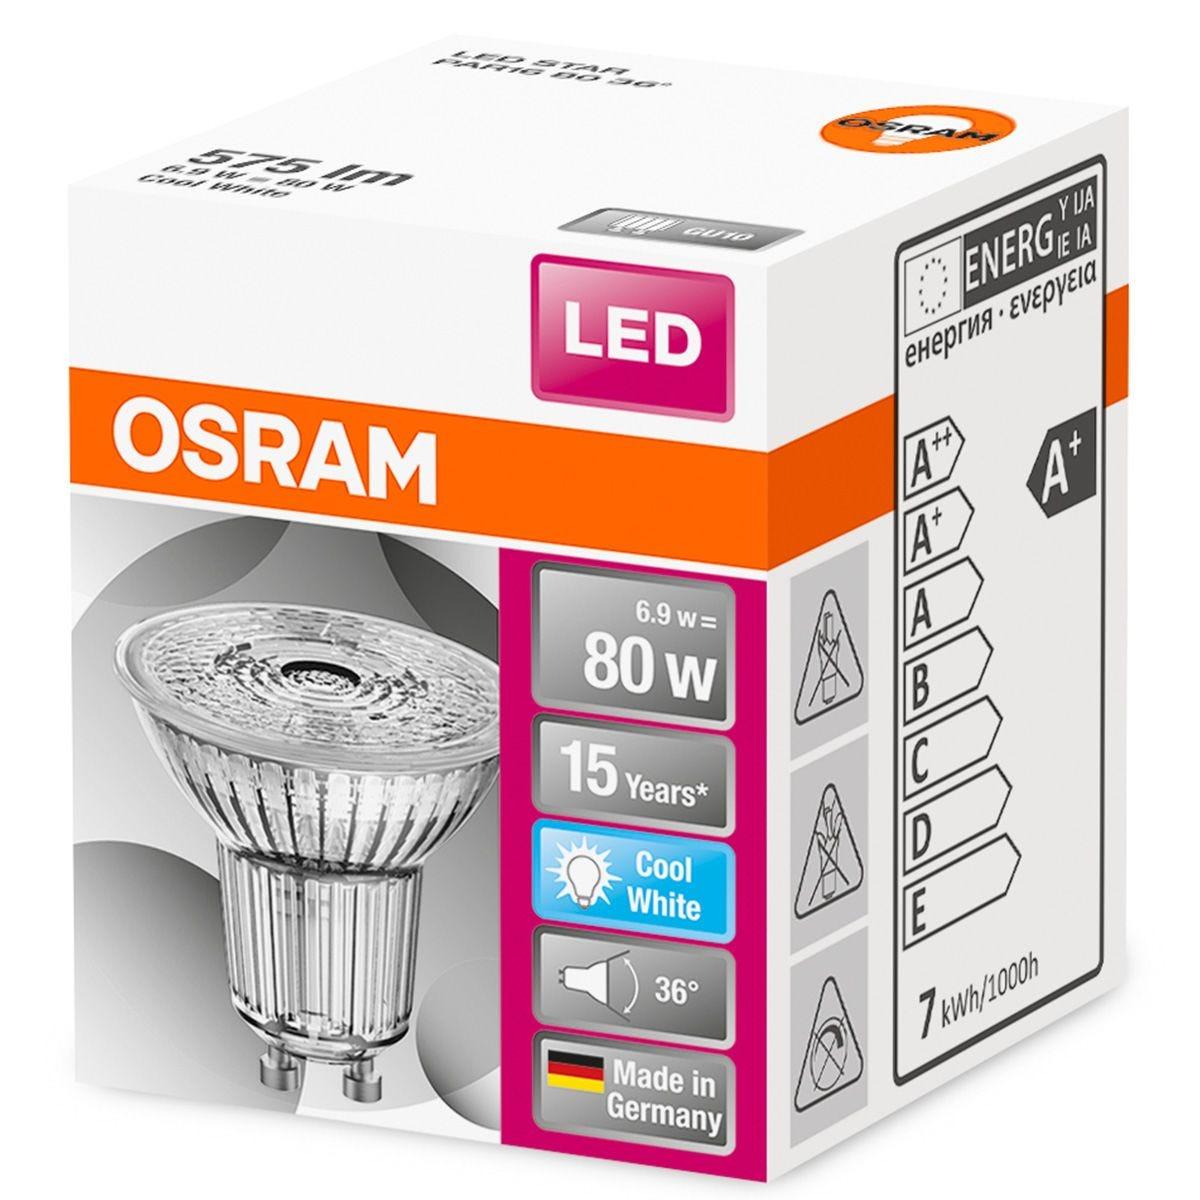 Osram 80W GU10 Bulb - Cool White